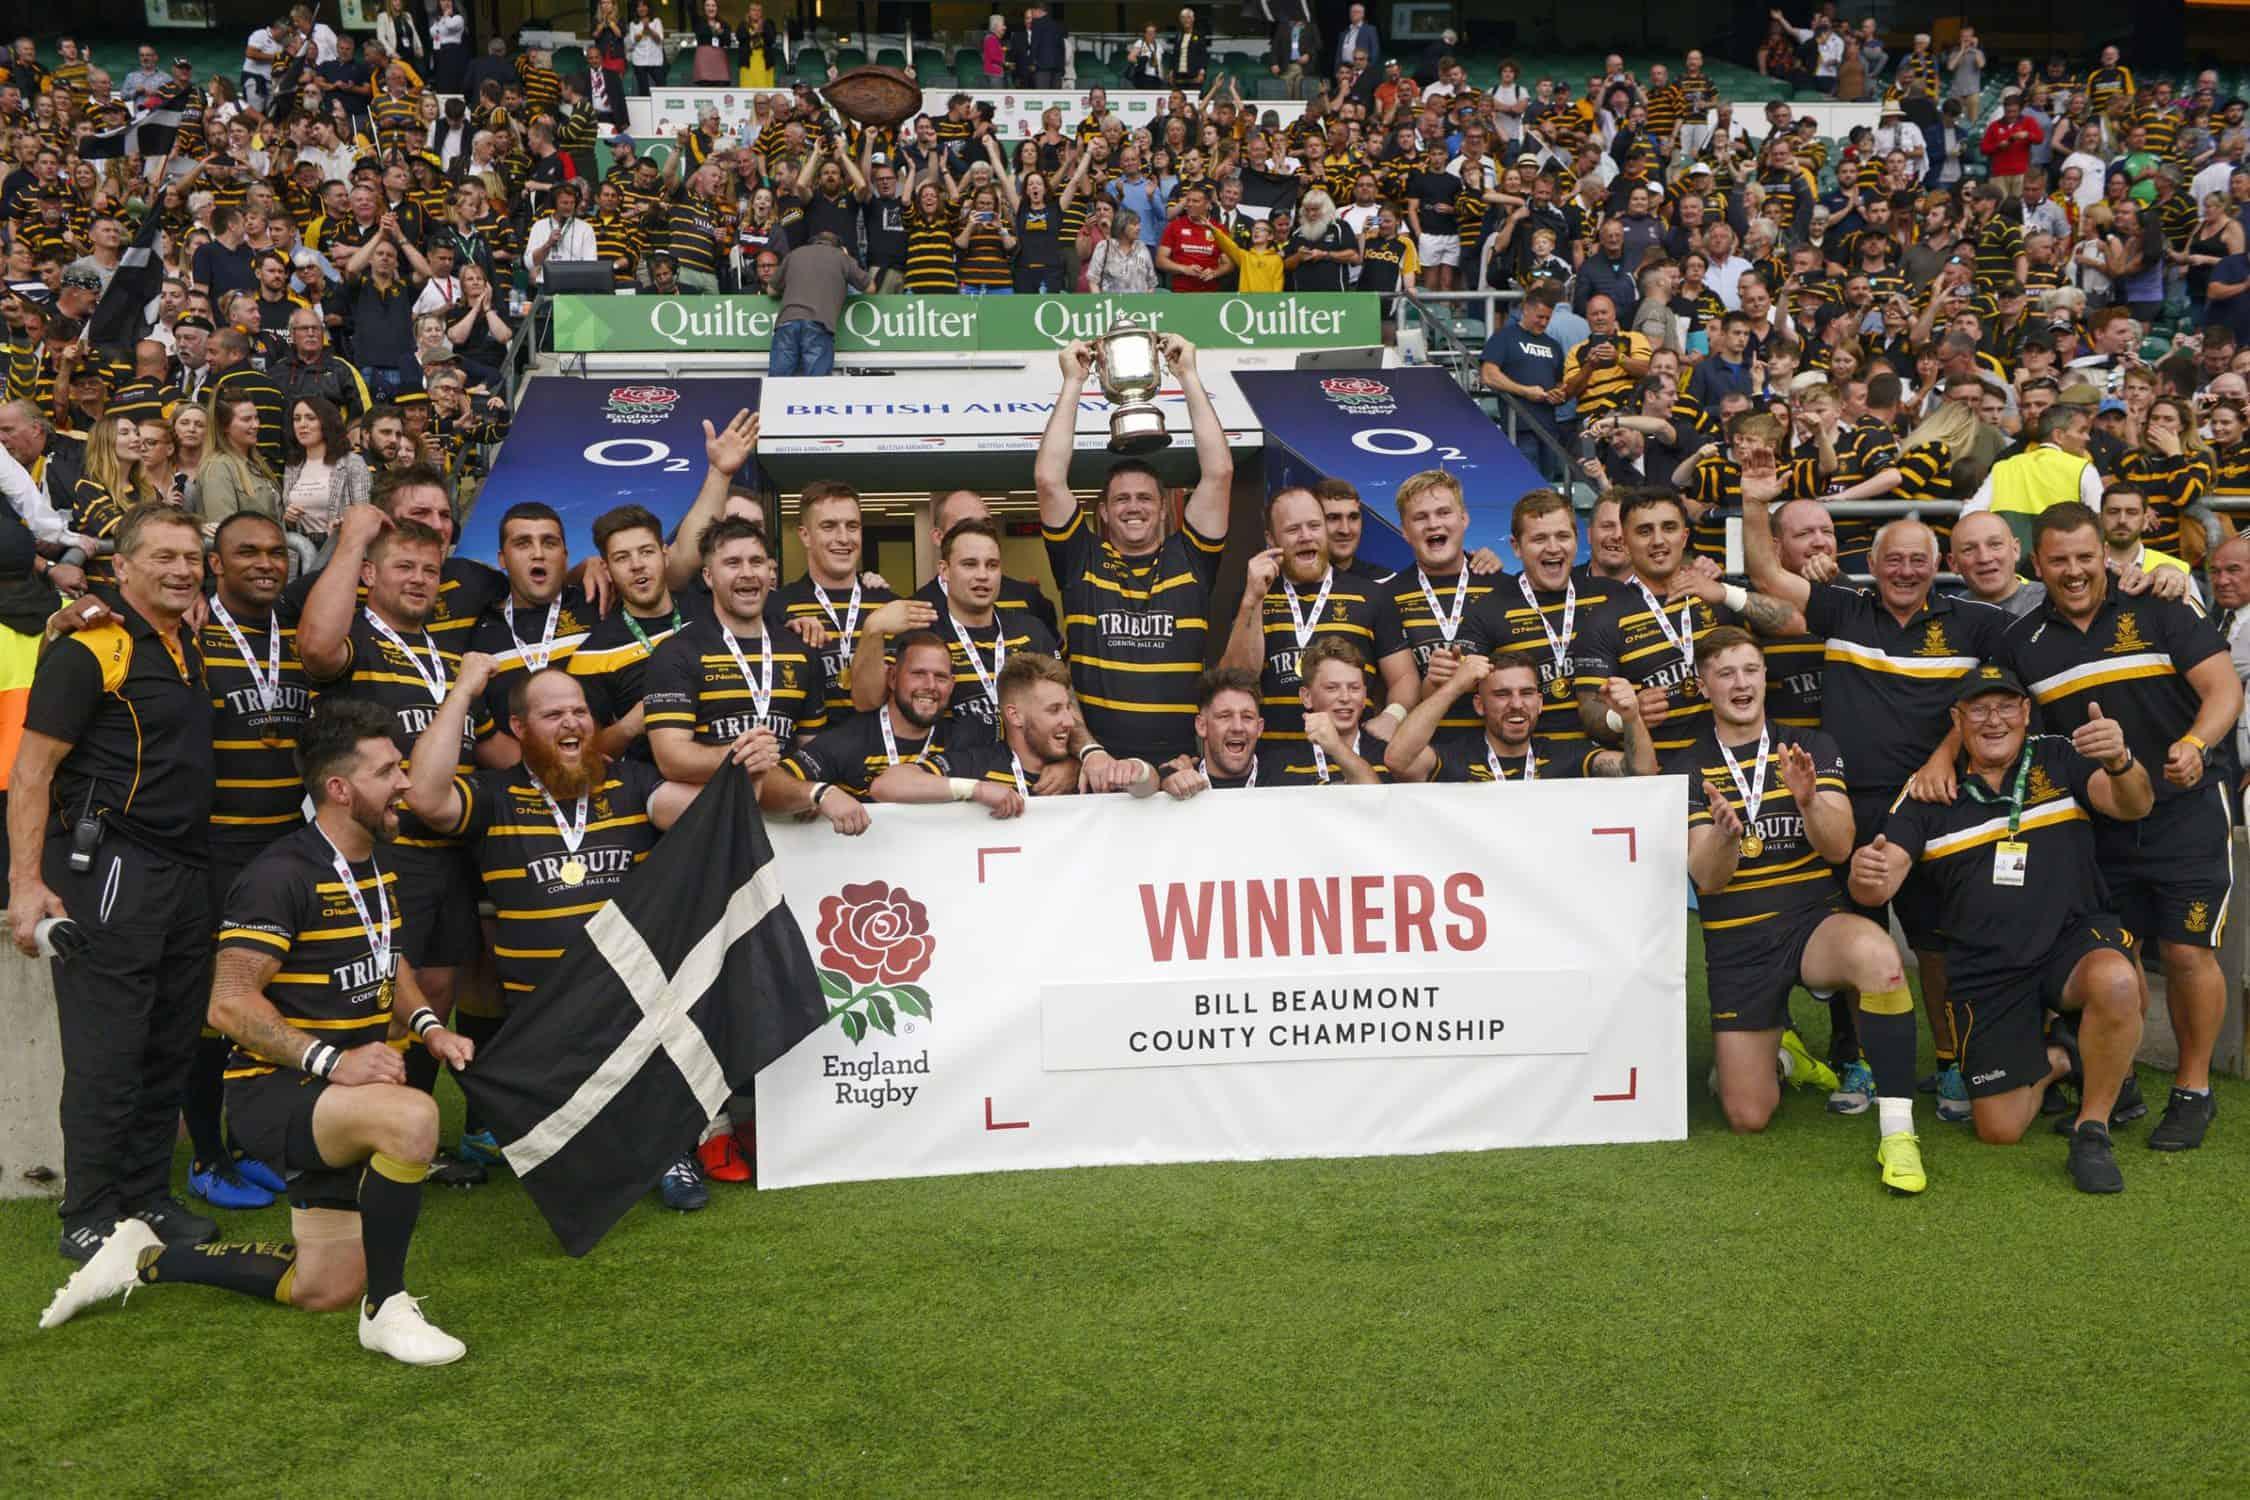 Bill Beaumont Cup Final, London UK – 02 June 2019